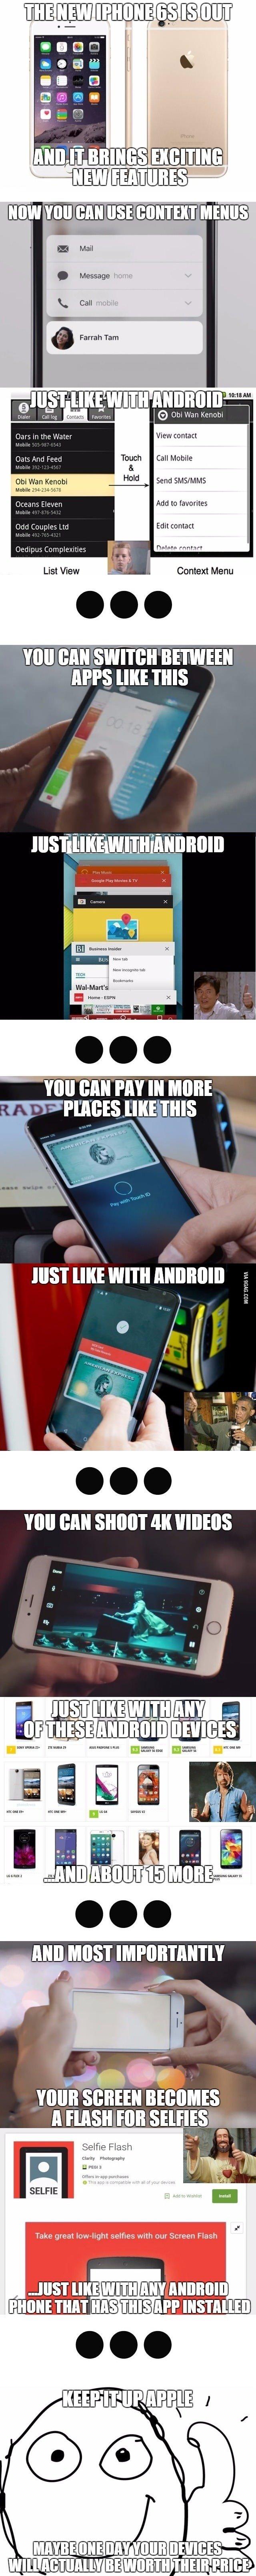 iphone ****